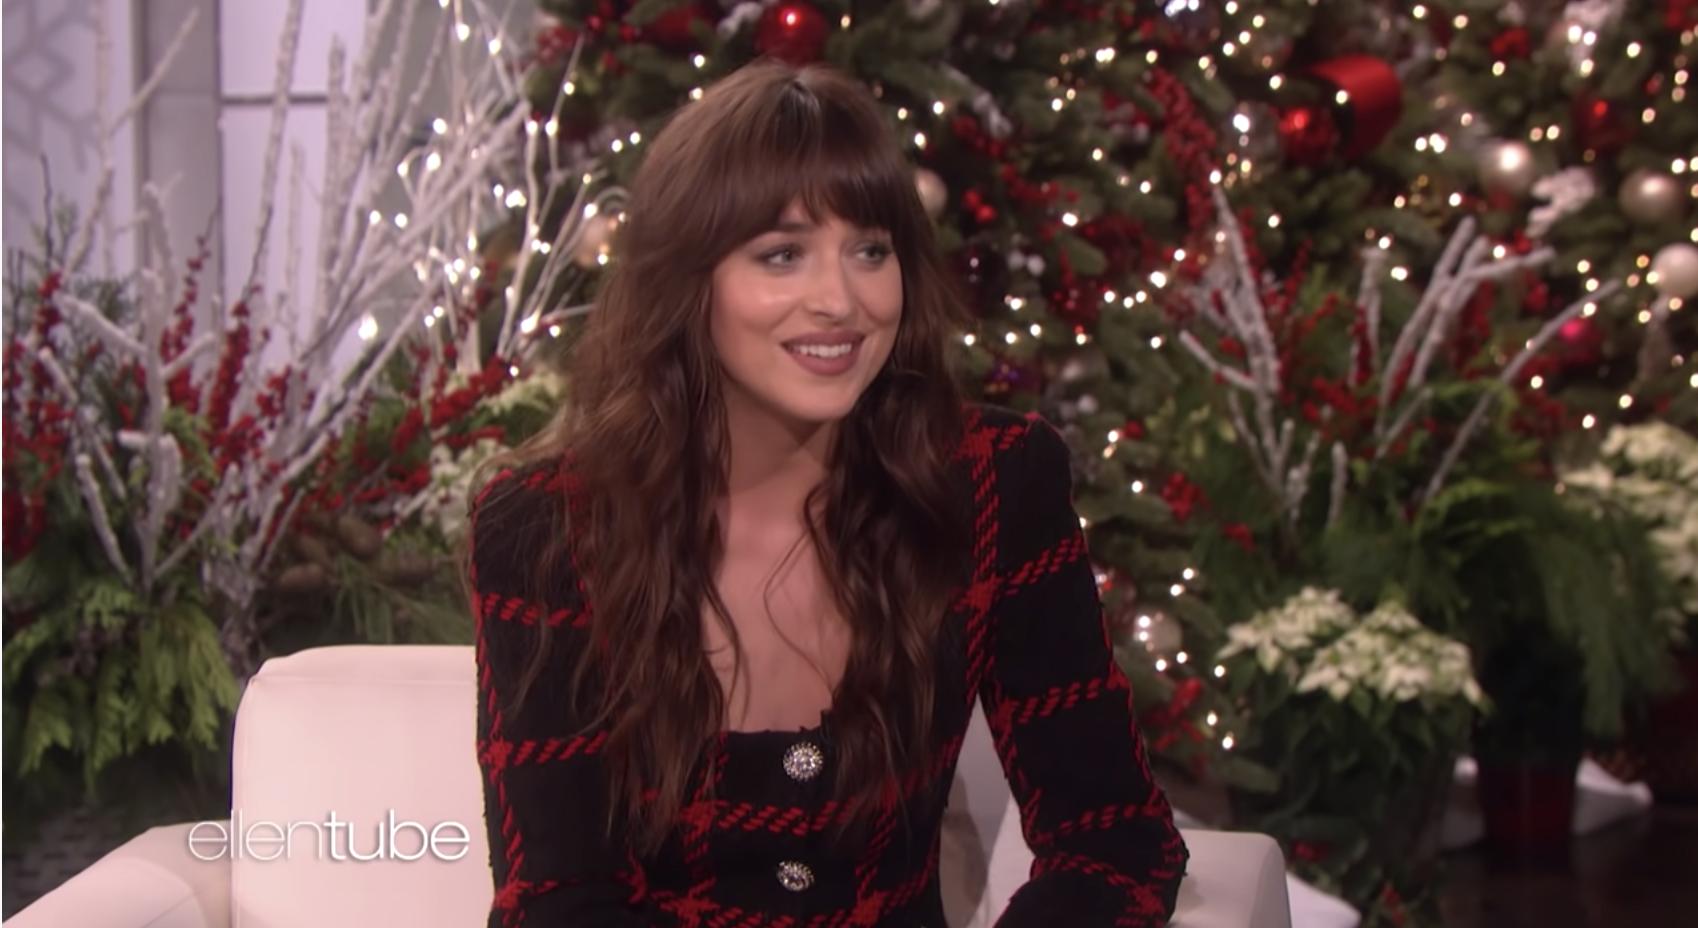 Dakota Johnson on The Ellen Show